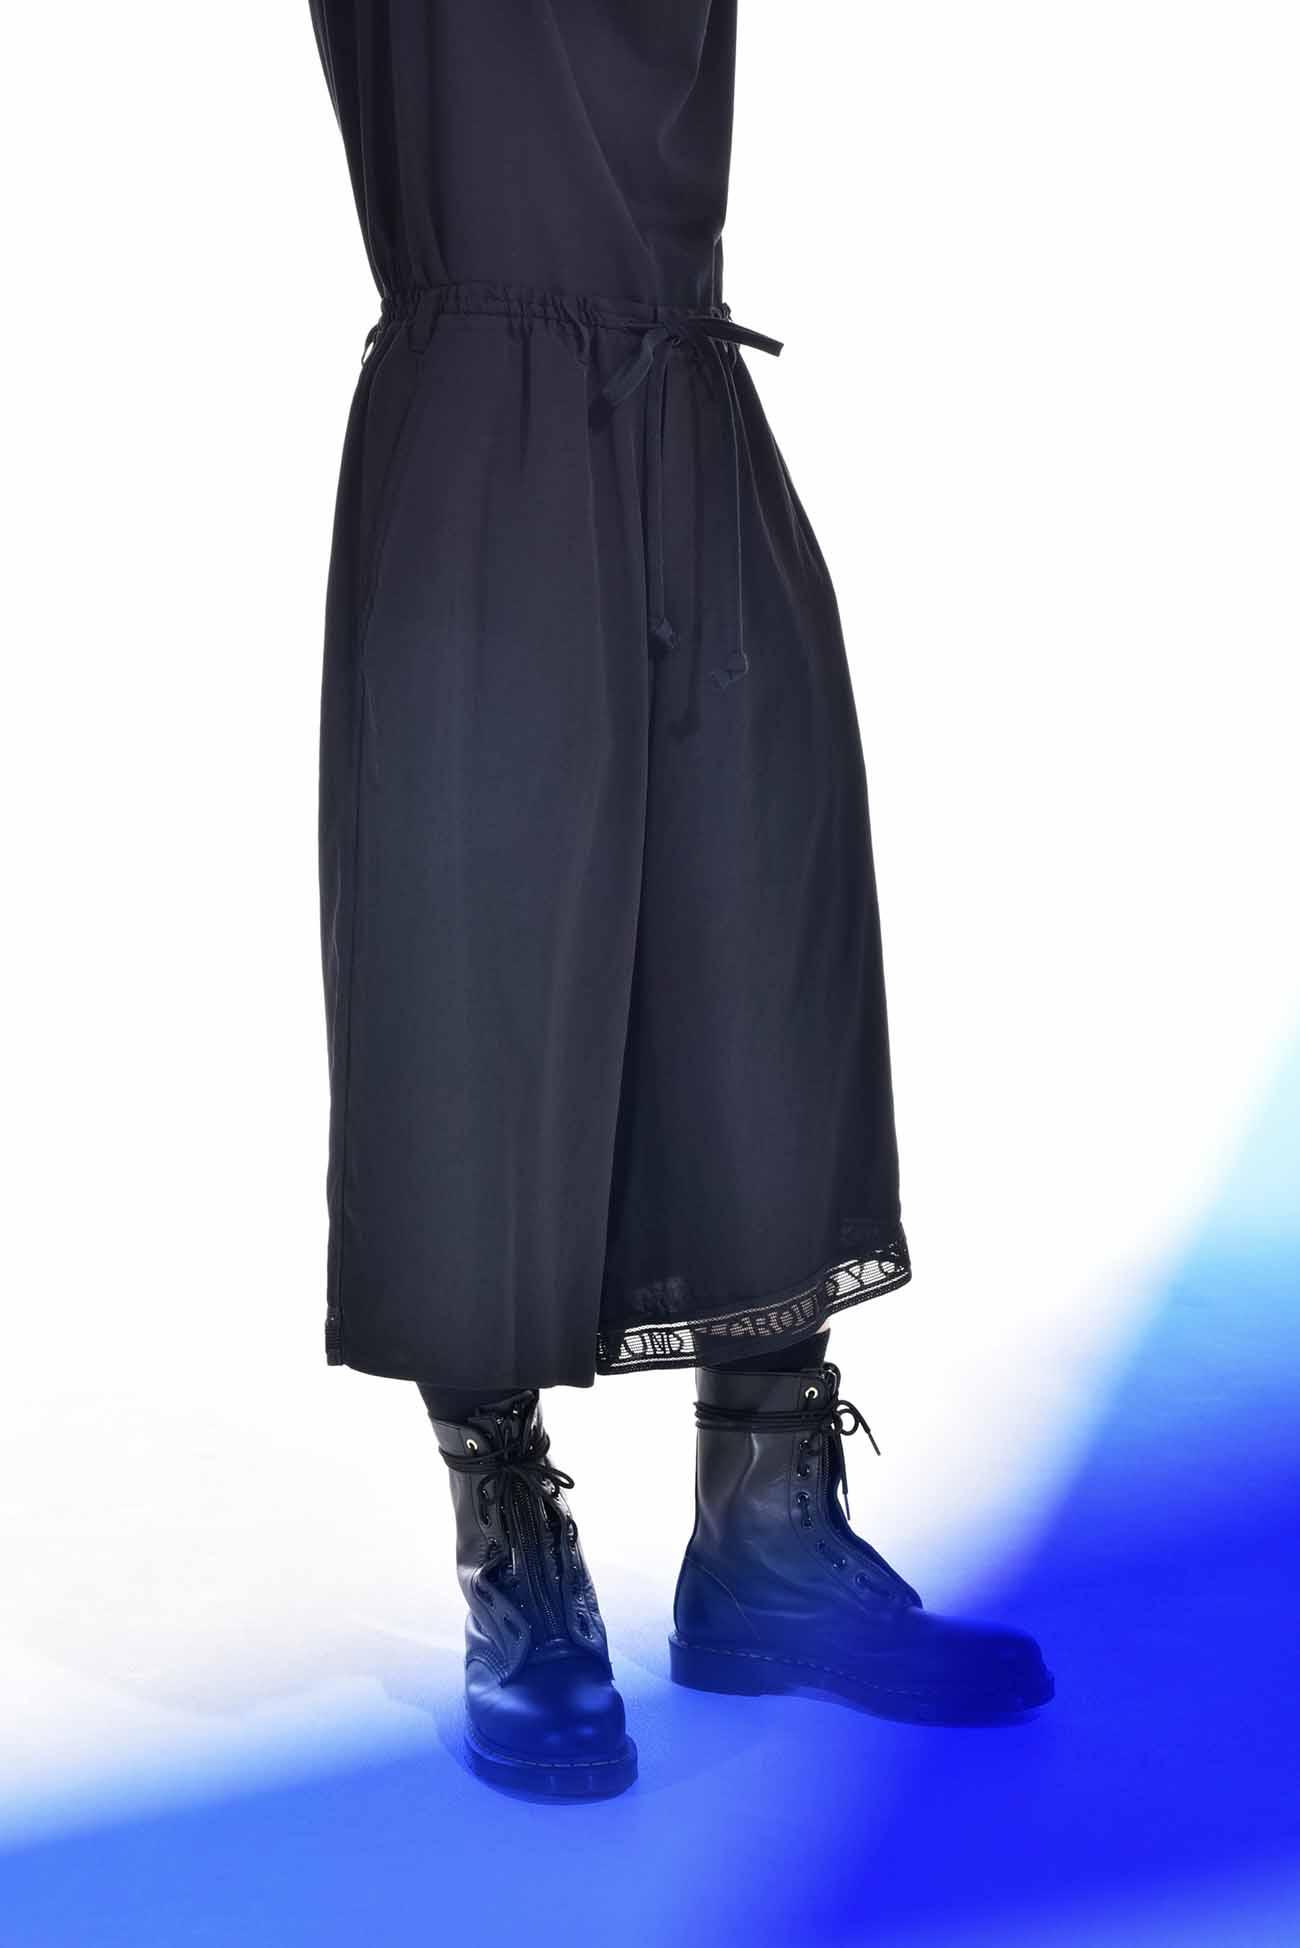 T /复古decyne原始胶带交叉高乔裤子